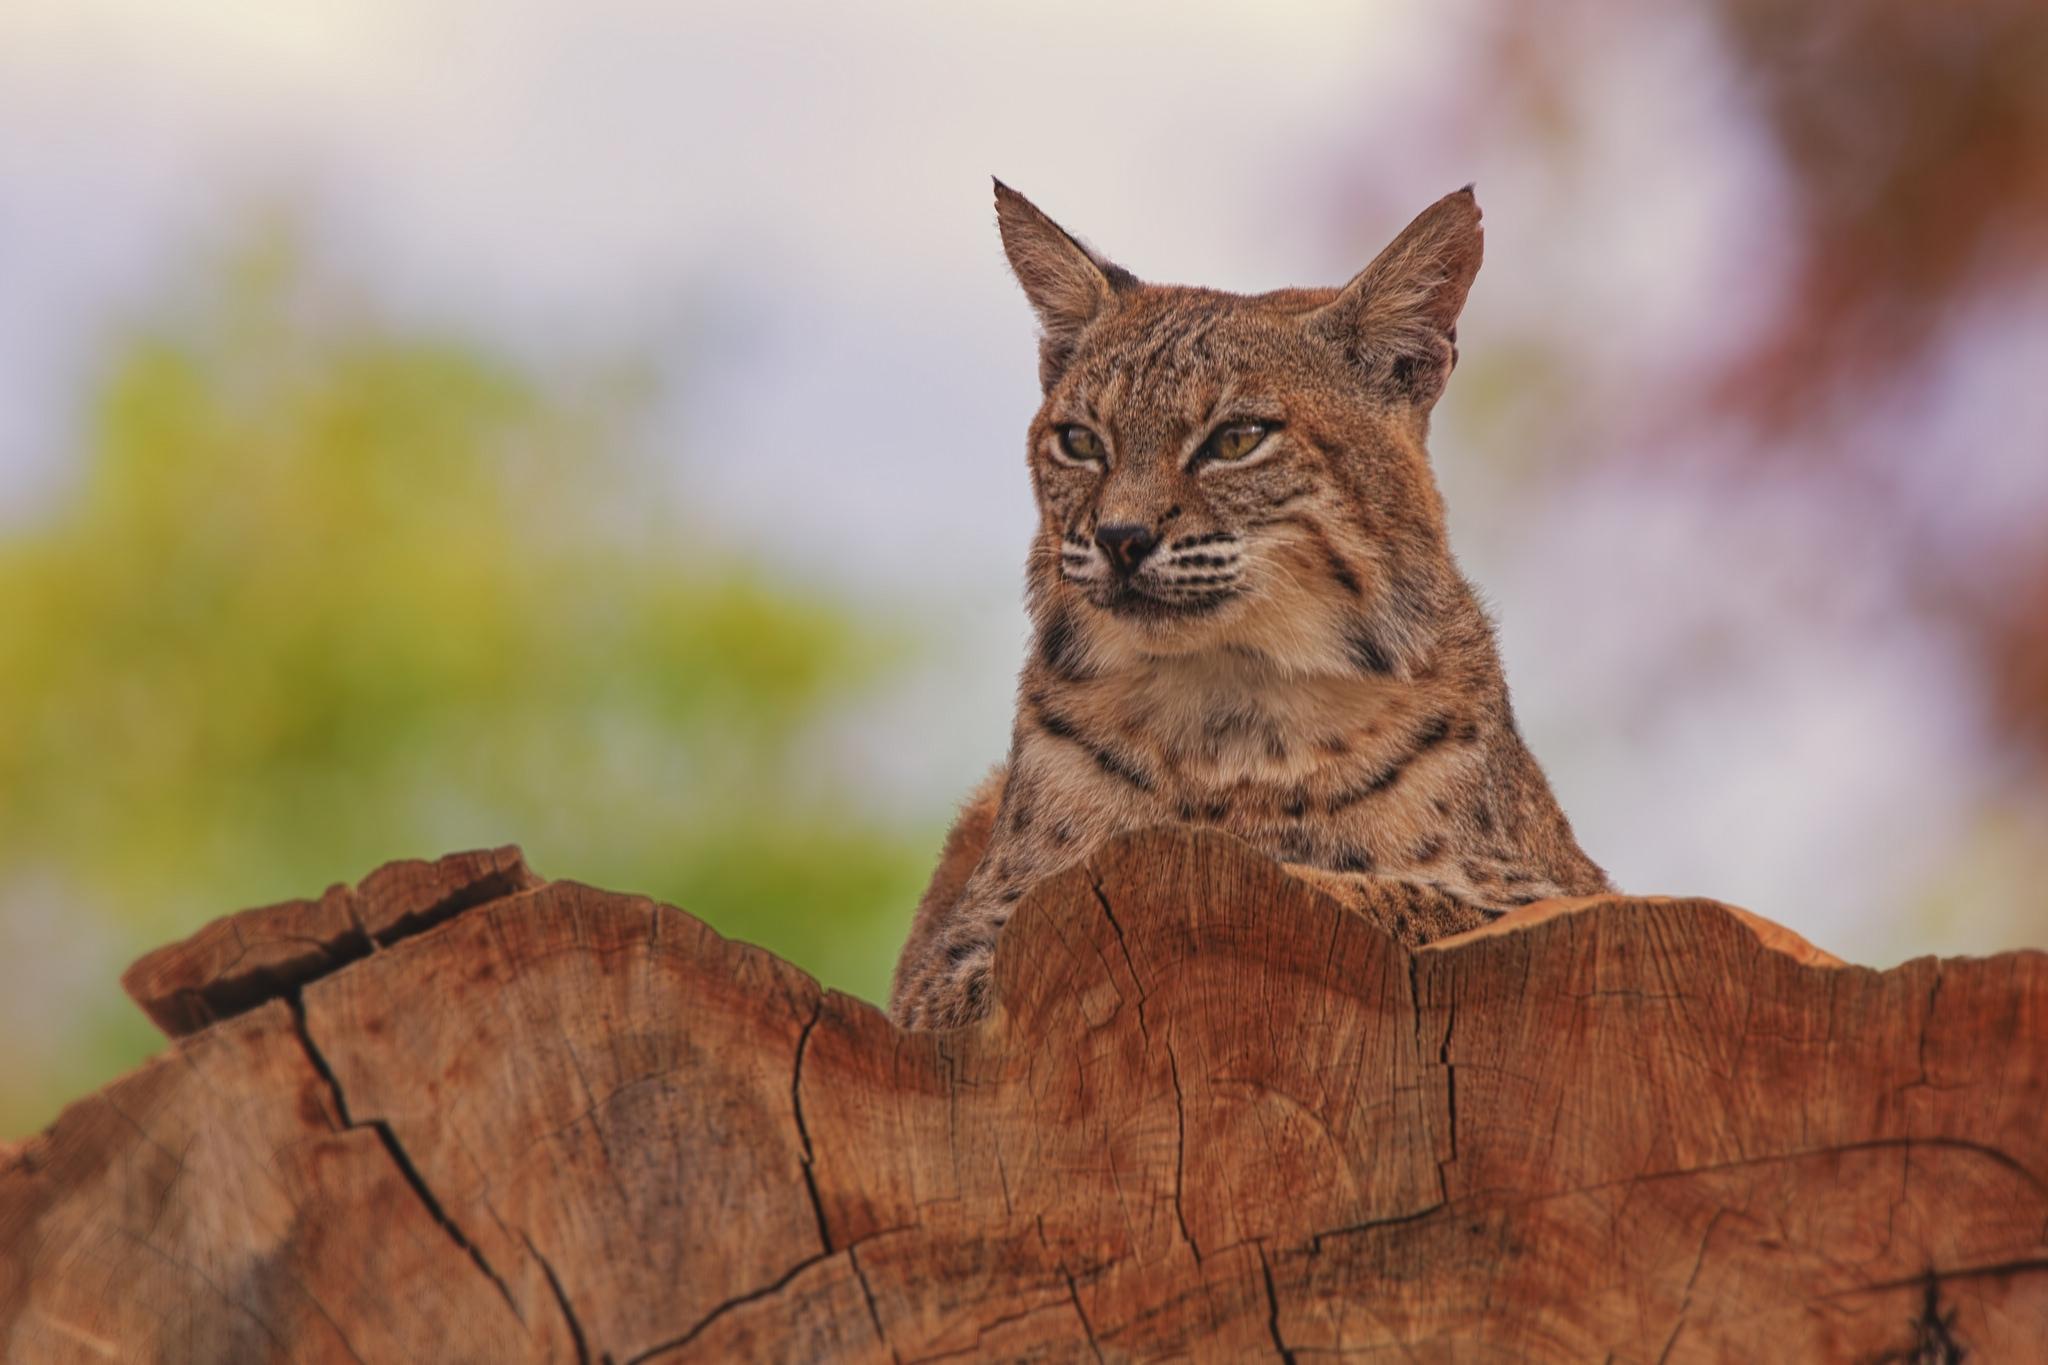 117884 download wallpaper Animals, Iris, Beast, Predator, Big Cat screensavers and pictures for free